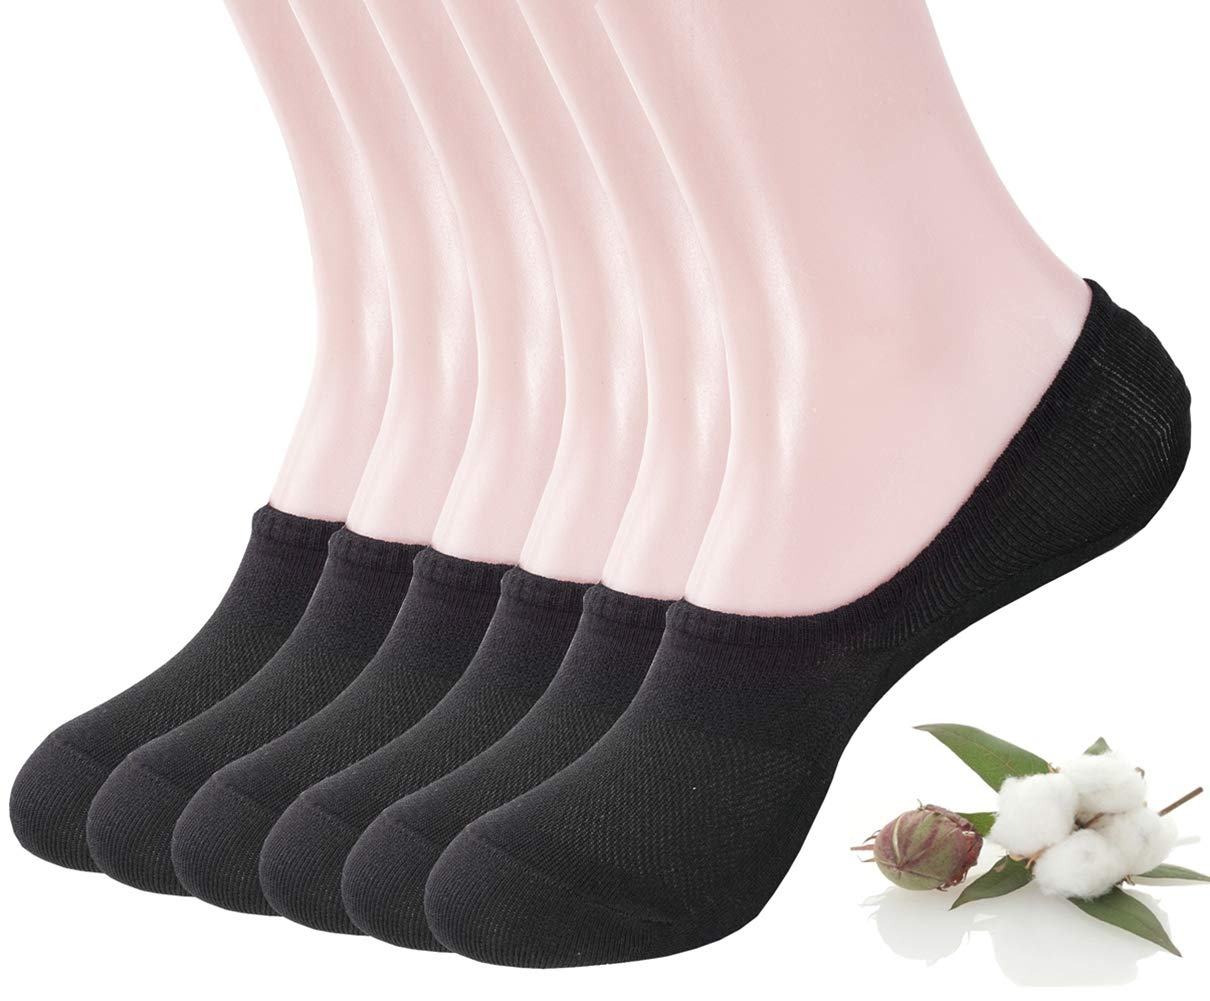 Women's Fashion No Show/Low cut Fun Socks 6 Pairs Packs Black